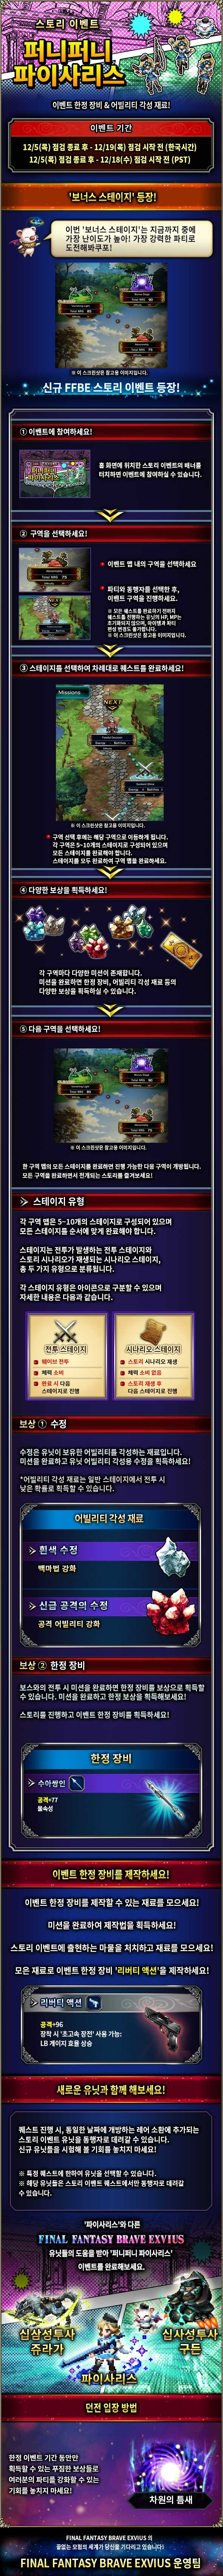 191204_news_banner_FunwithPhysalis_ko.jpg